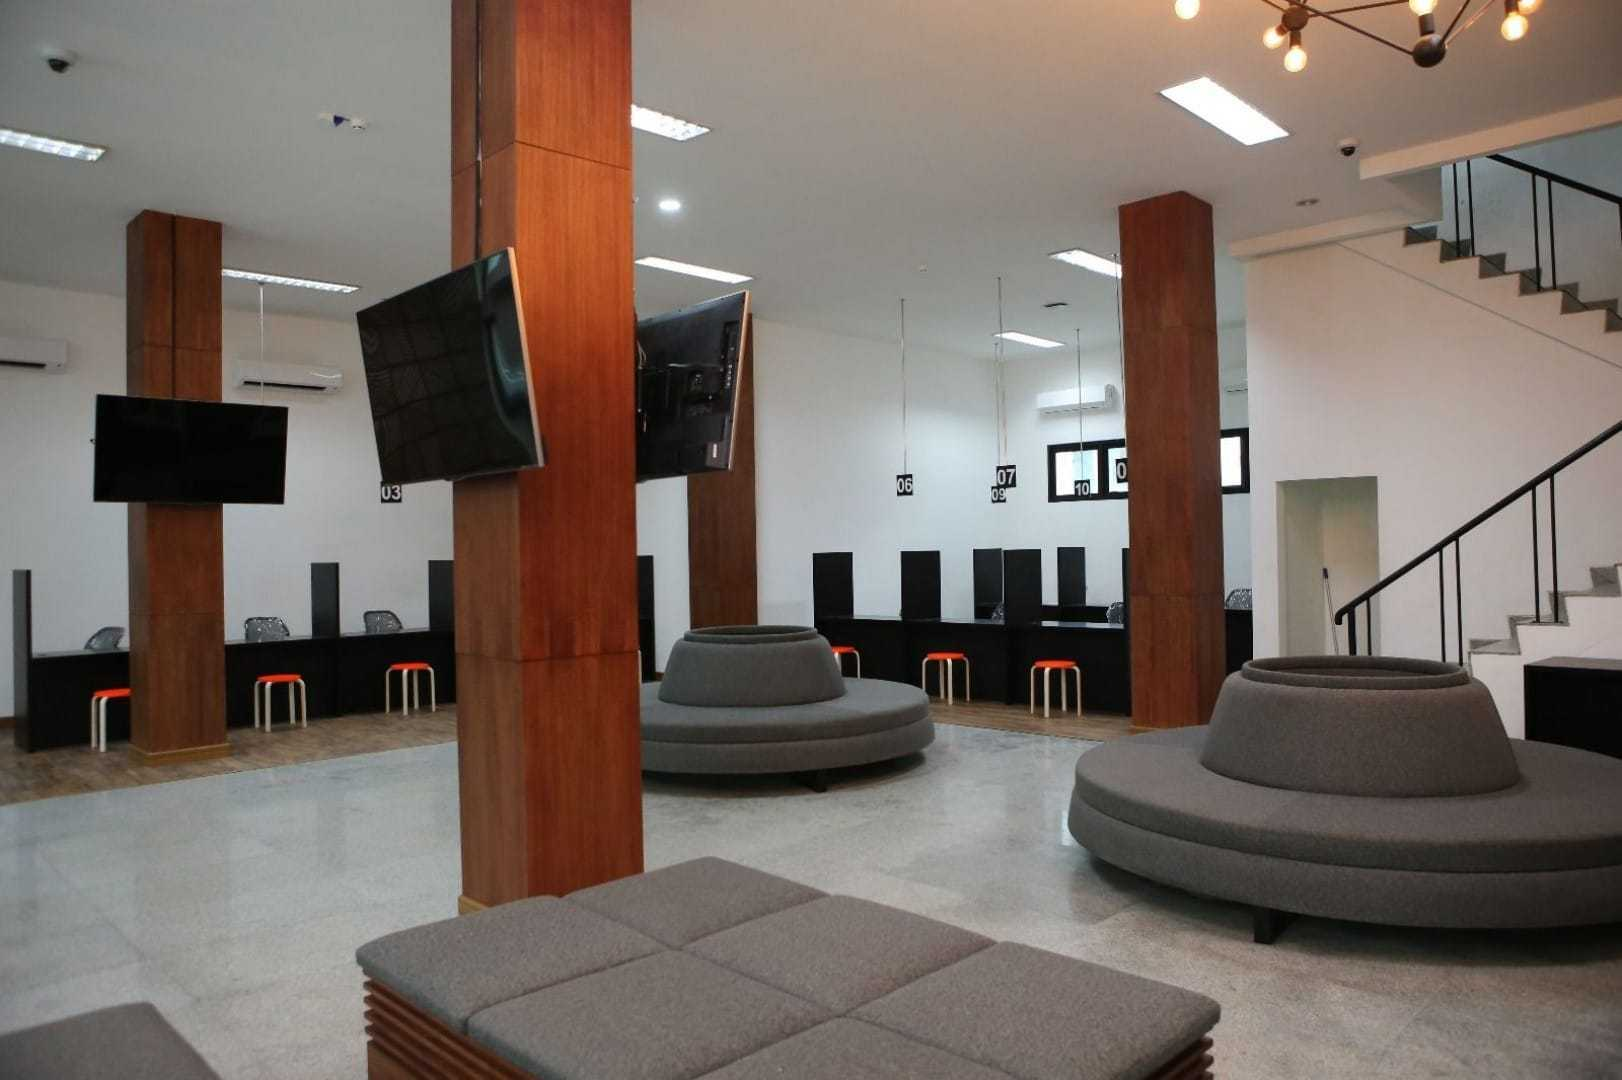 Design & Build By Fabelio.com Uber Jakarta, Daerah Khusus Ibukota Jakarta, Indonesia Jakarta, Daerah Khusus Ibukota Jakarta, Indonesia Waiting Area Kontemporer 53914